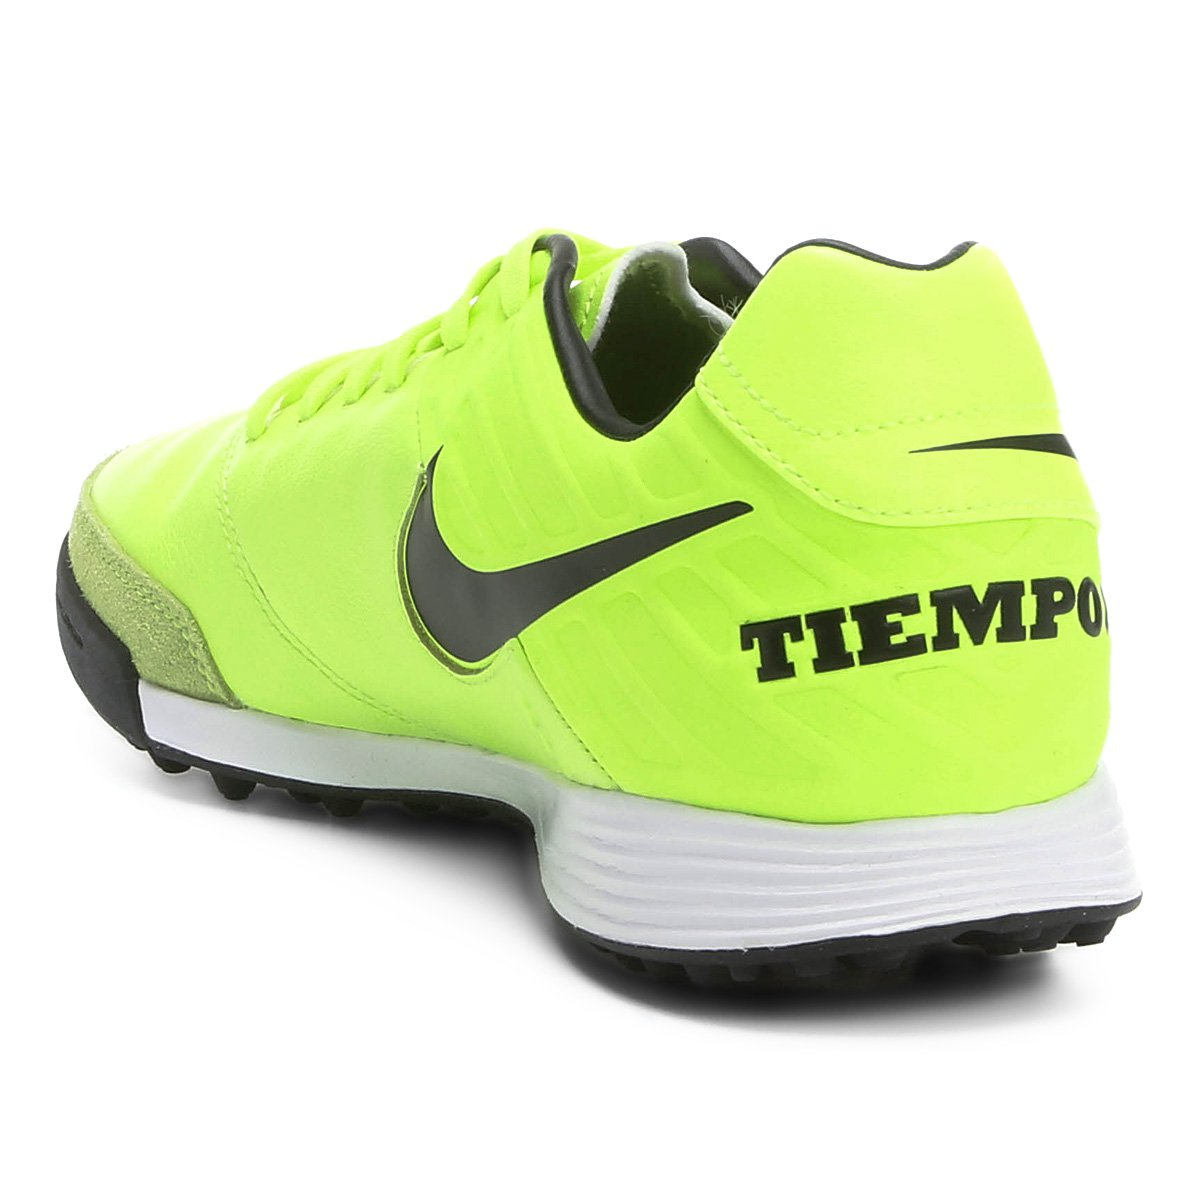 Chuteira Society Nike Tiempo Mystic 5 TF - Verde claro - Compre ... c4809f655056b